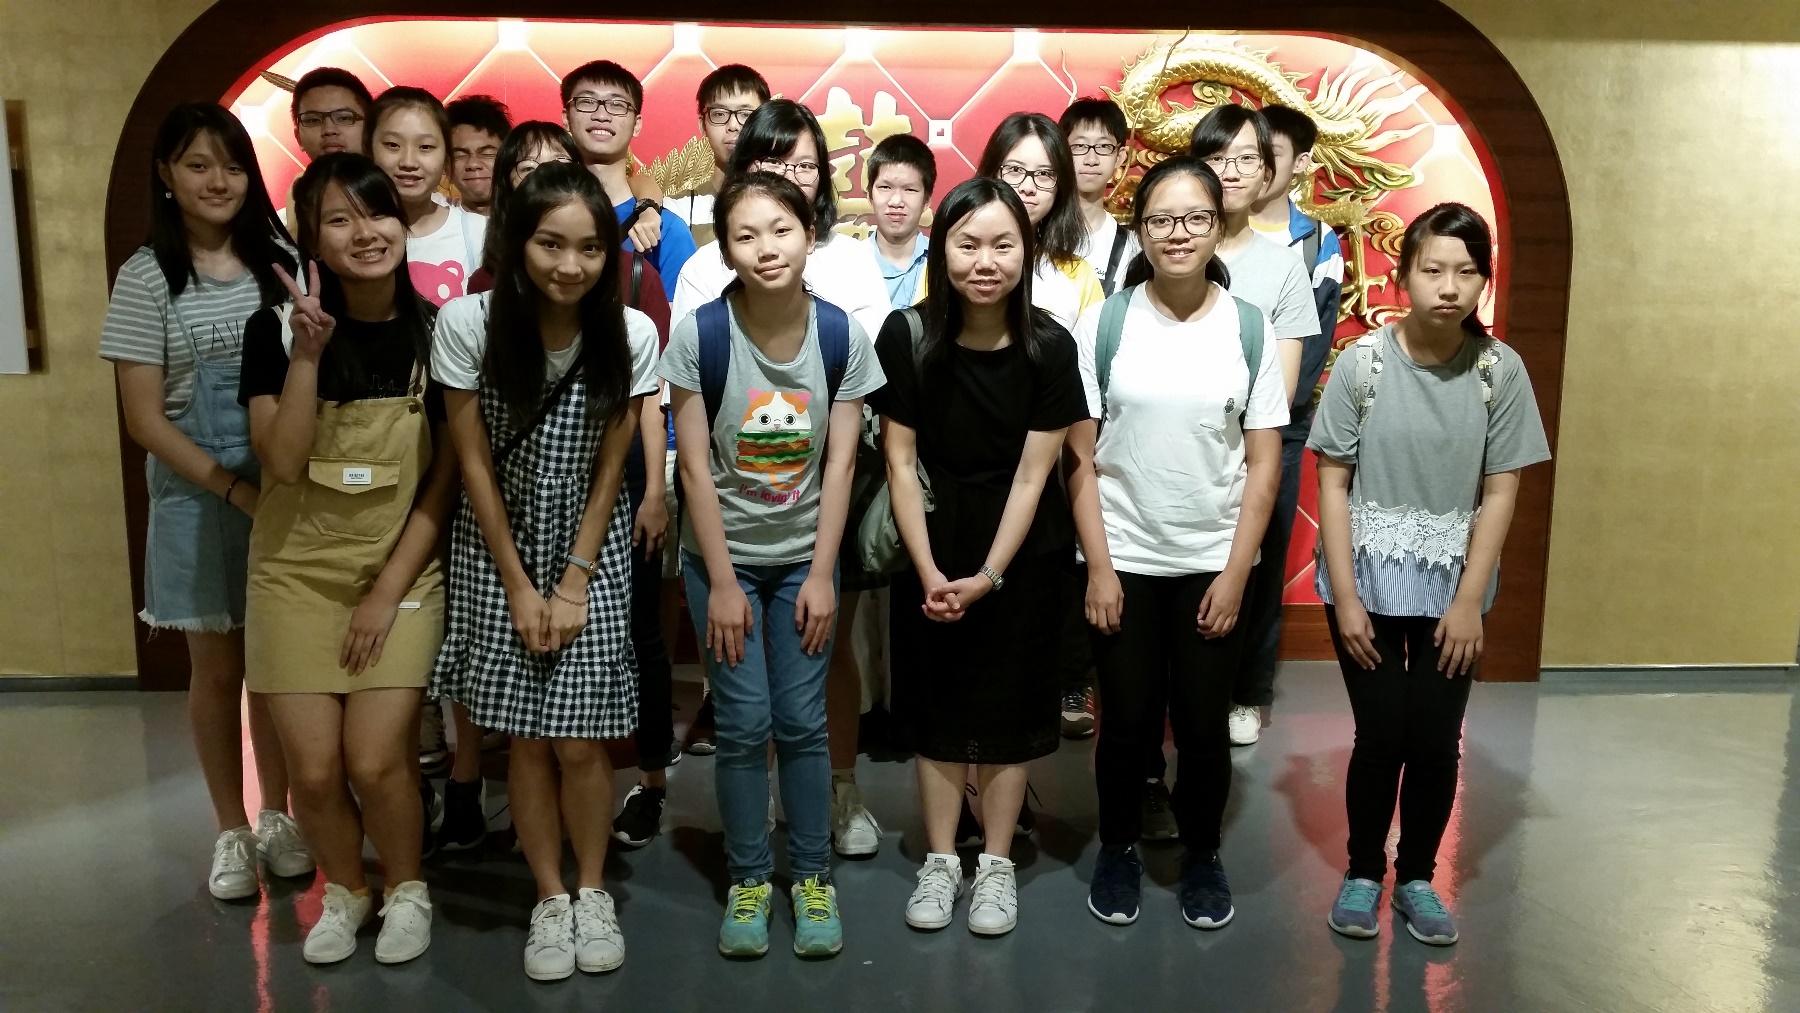 http://www.npc.edu.hk/sites/default/files/20180630_102253.jpg